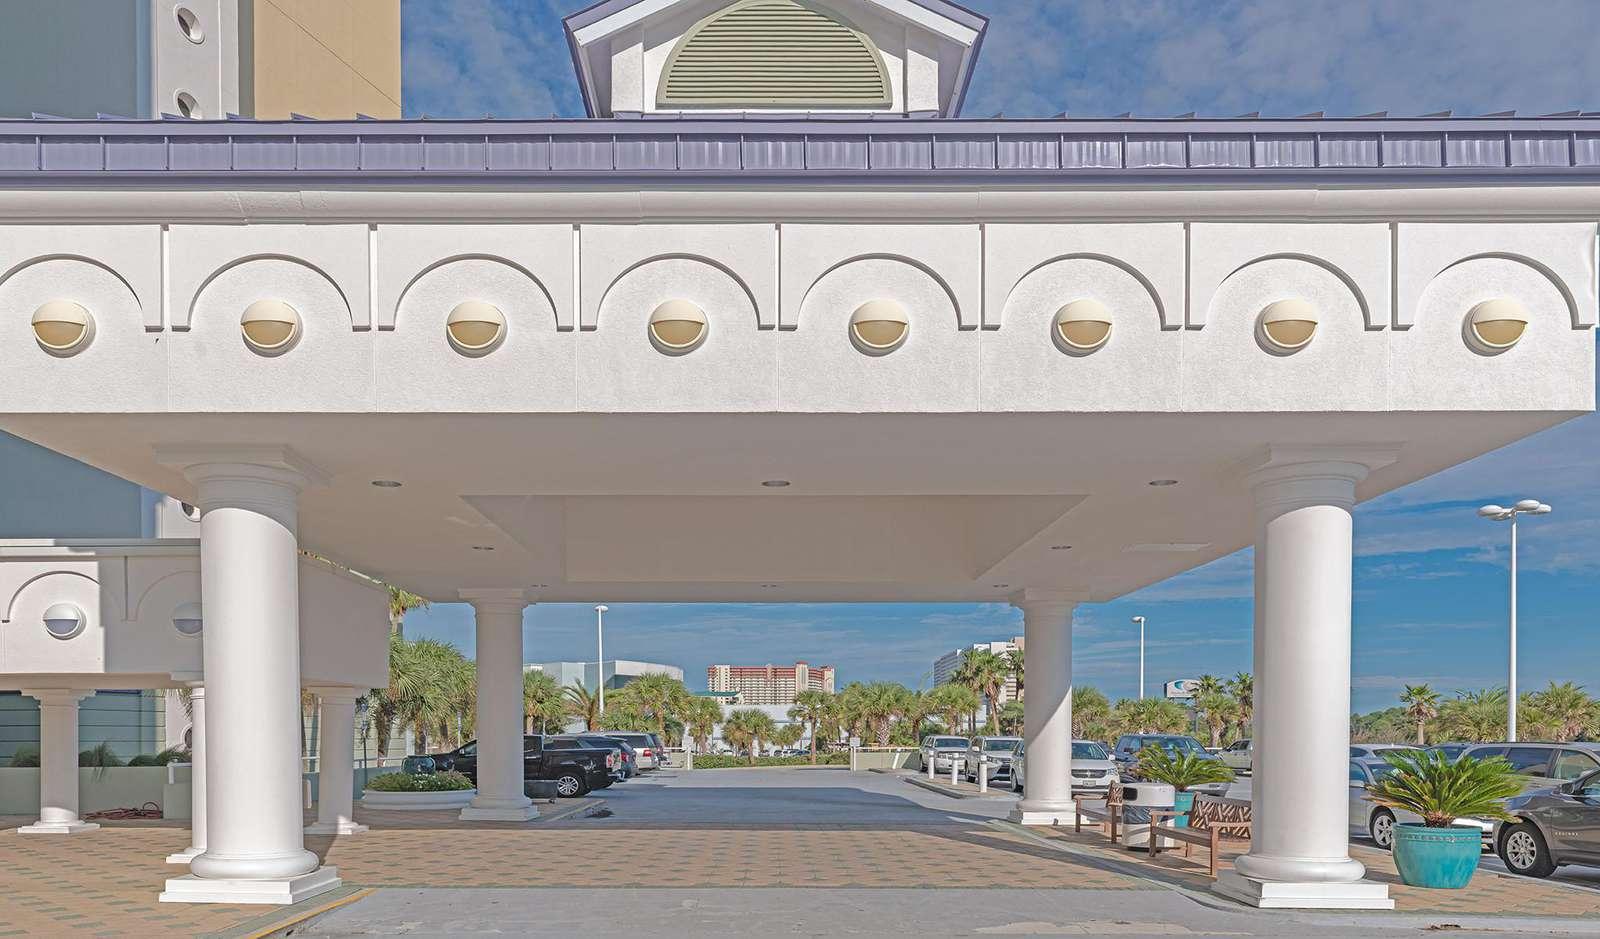 Grand entry awaits you at Boardwalk!